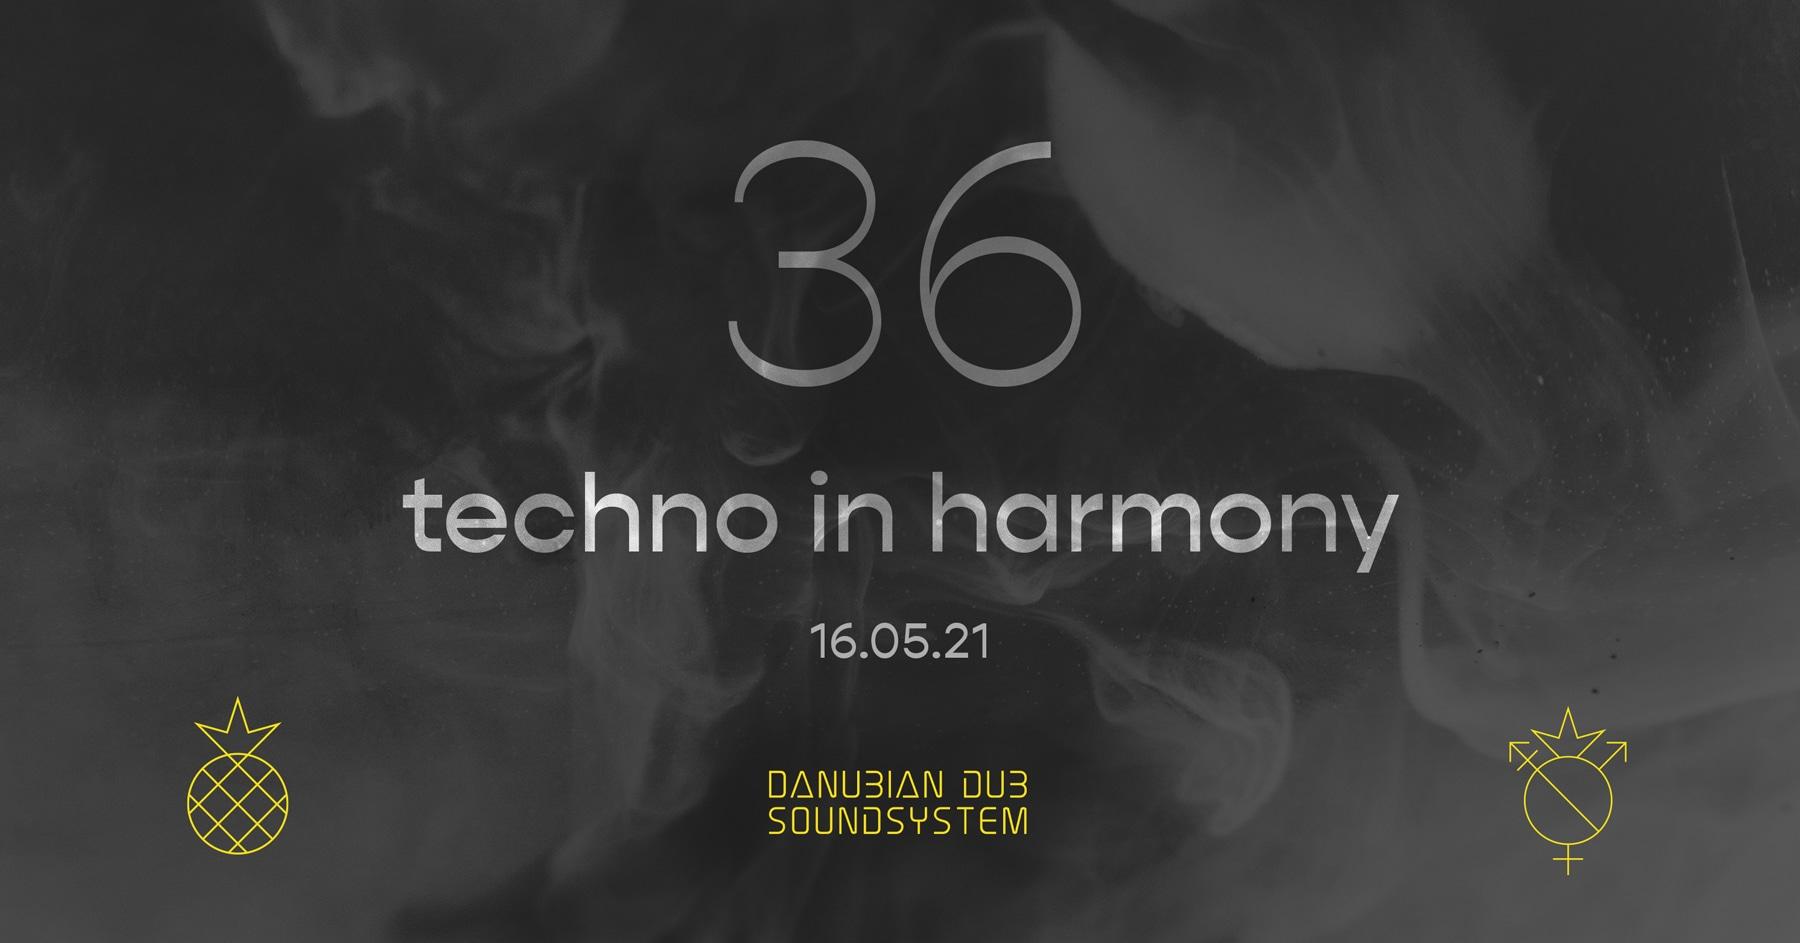 Events Wien: 36 – Techno in Harmony